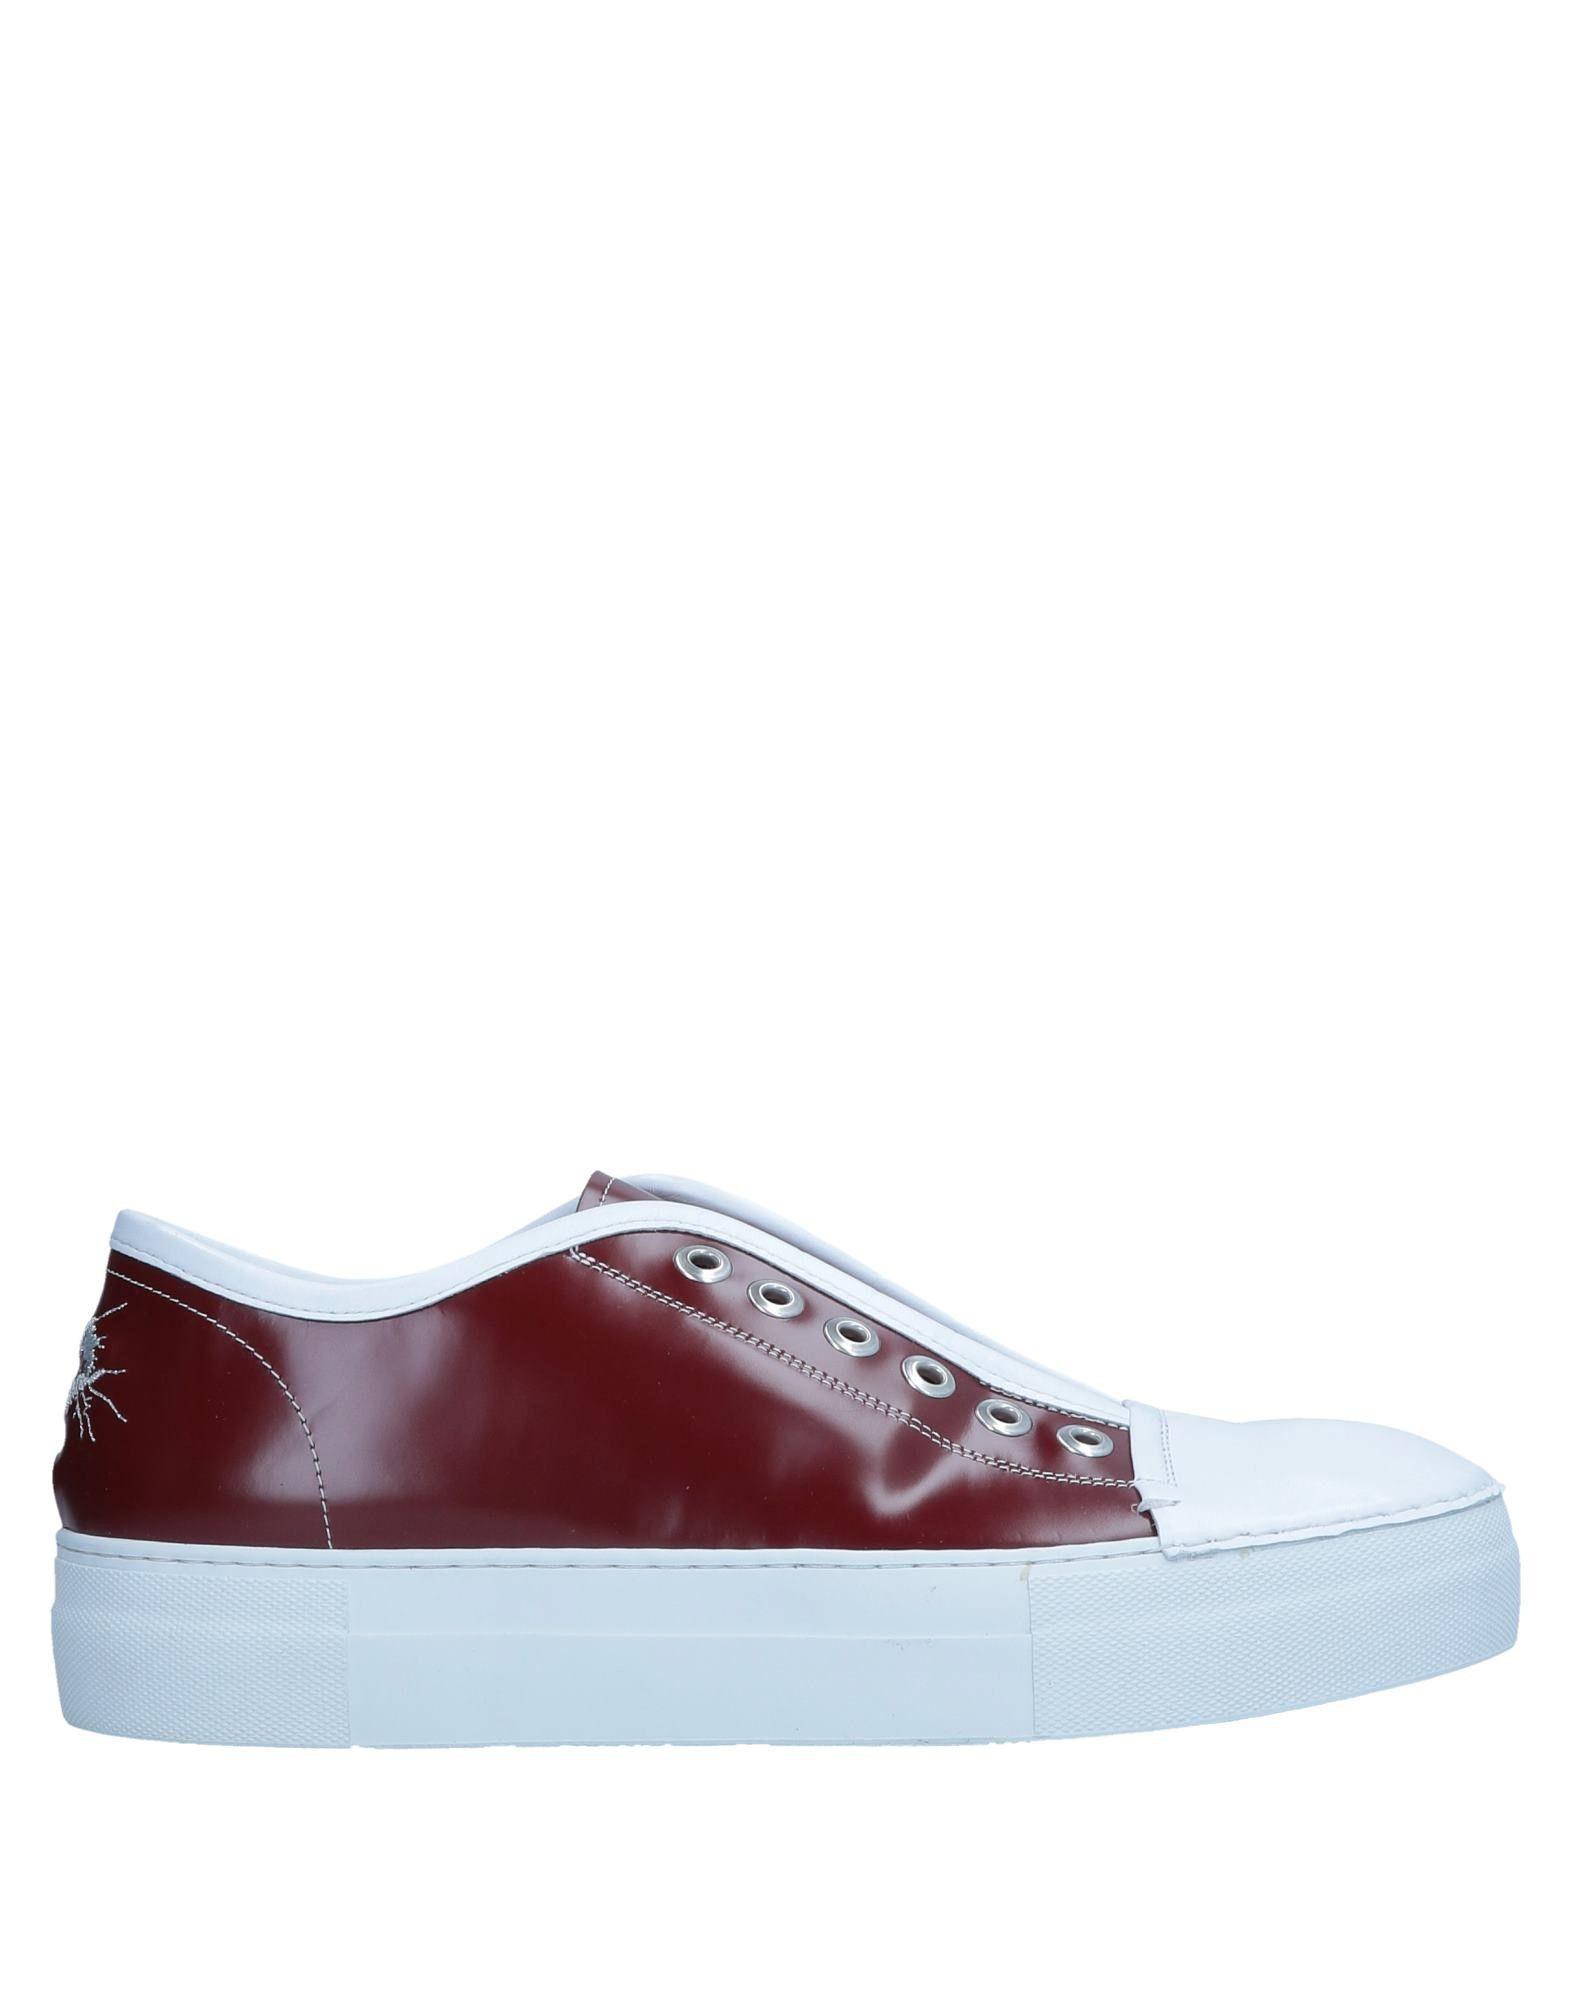 Rocco P. Sneakers Herren  11553802ND Gute Qualität beliebte Schuhe